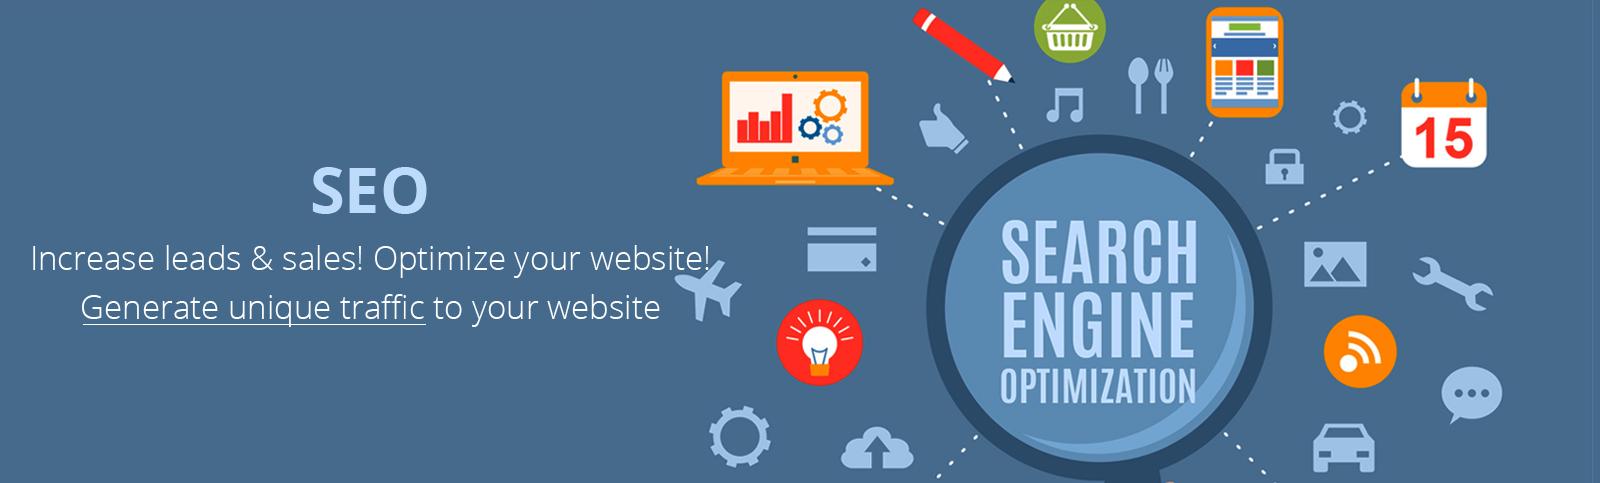 SEO Company India| Website Promotion | Google Adwords